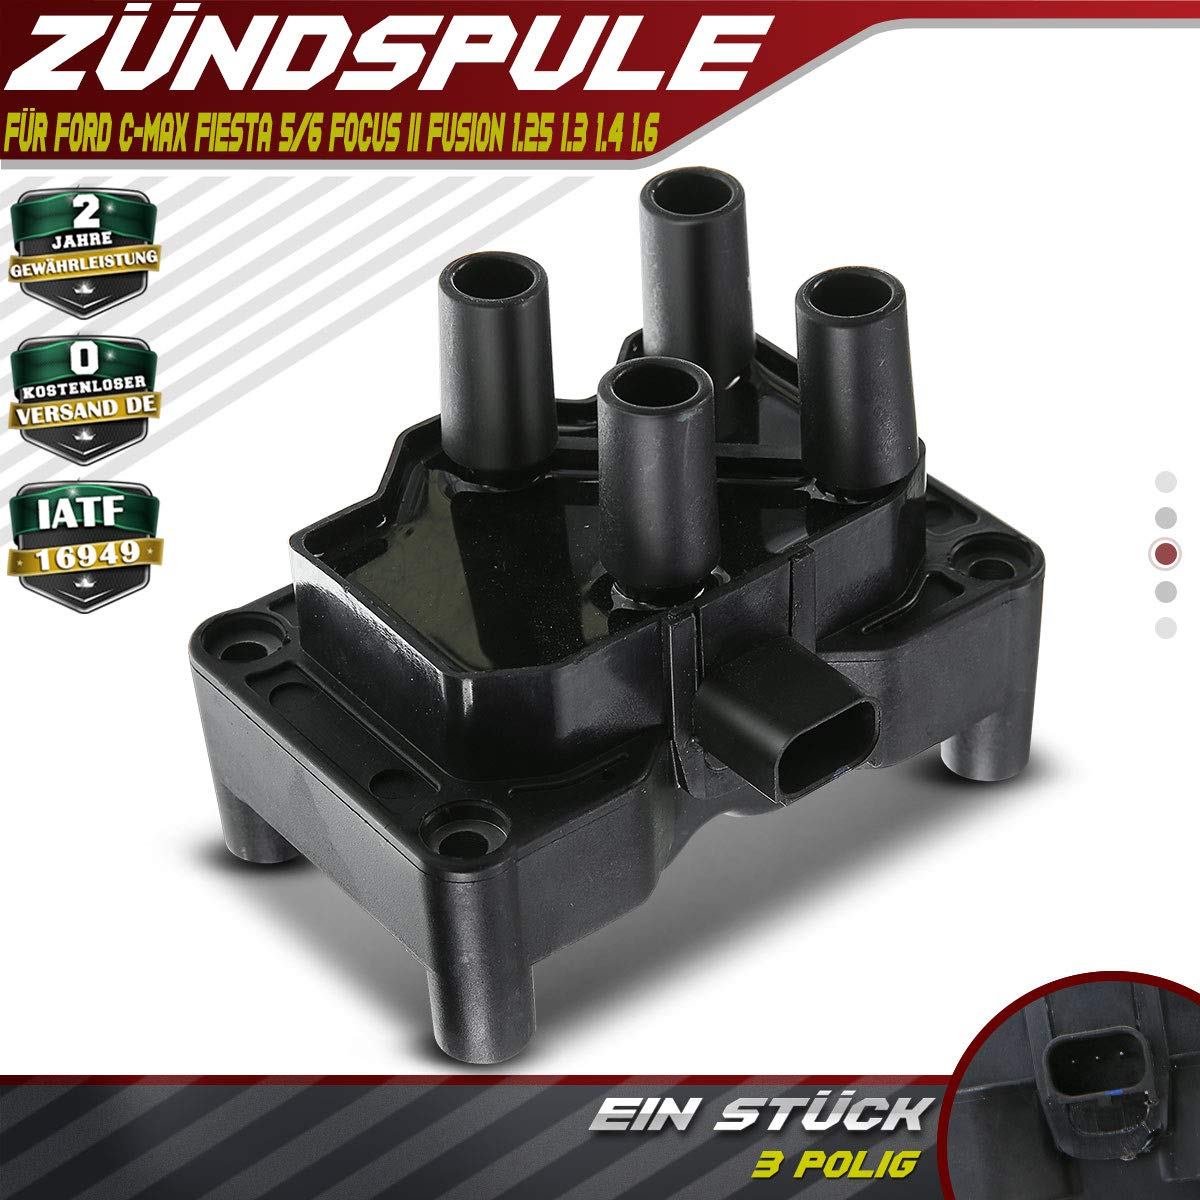 Z/ündspule f/ür C-Max DM2 Fiesta V JH/_ JD/_ VI CB1 CCN Focus C-Max II DA/_ HCP DP DA/_ Fusion JU/_ 2003-2012 1350562